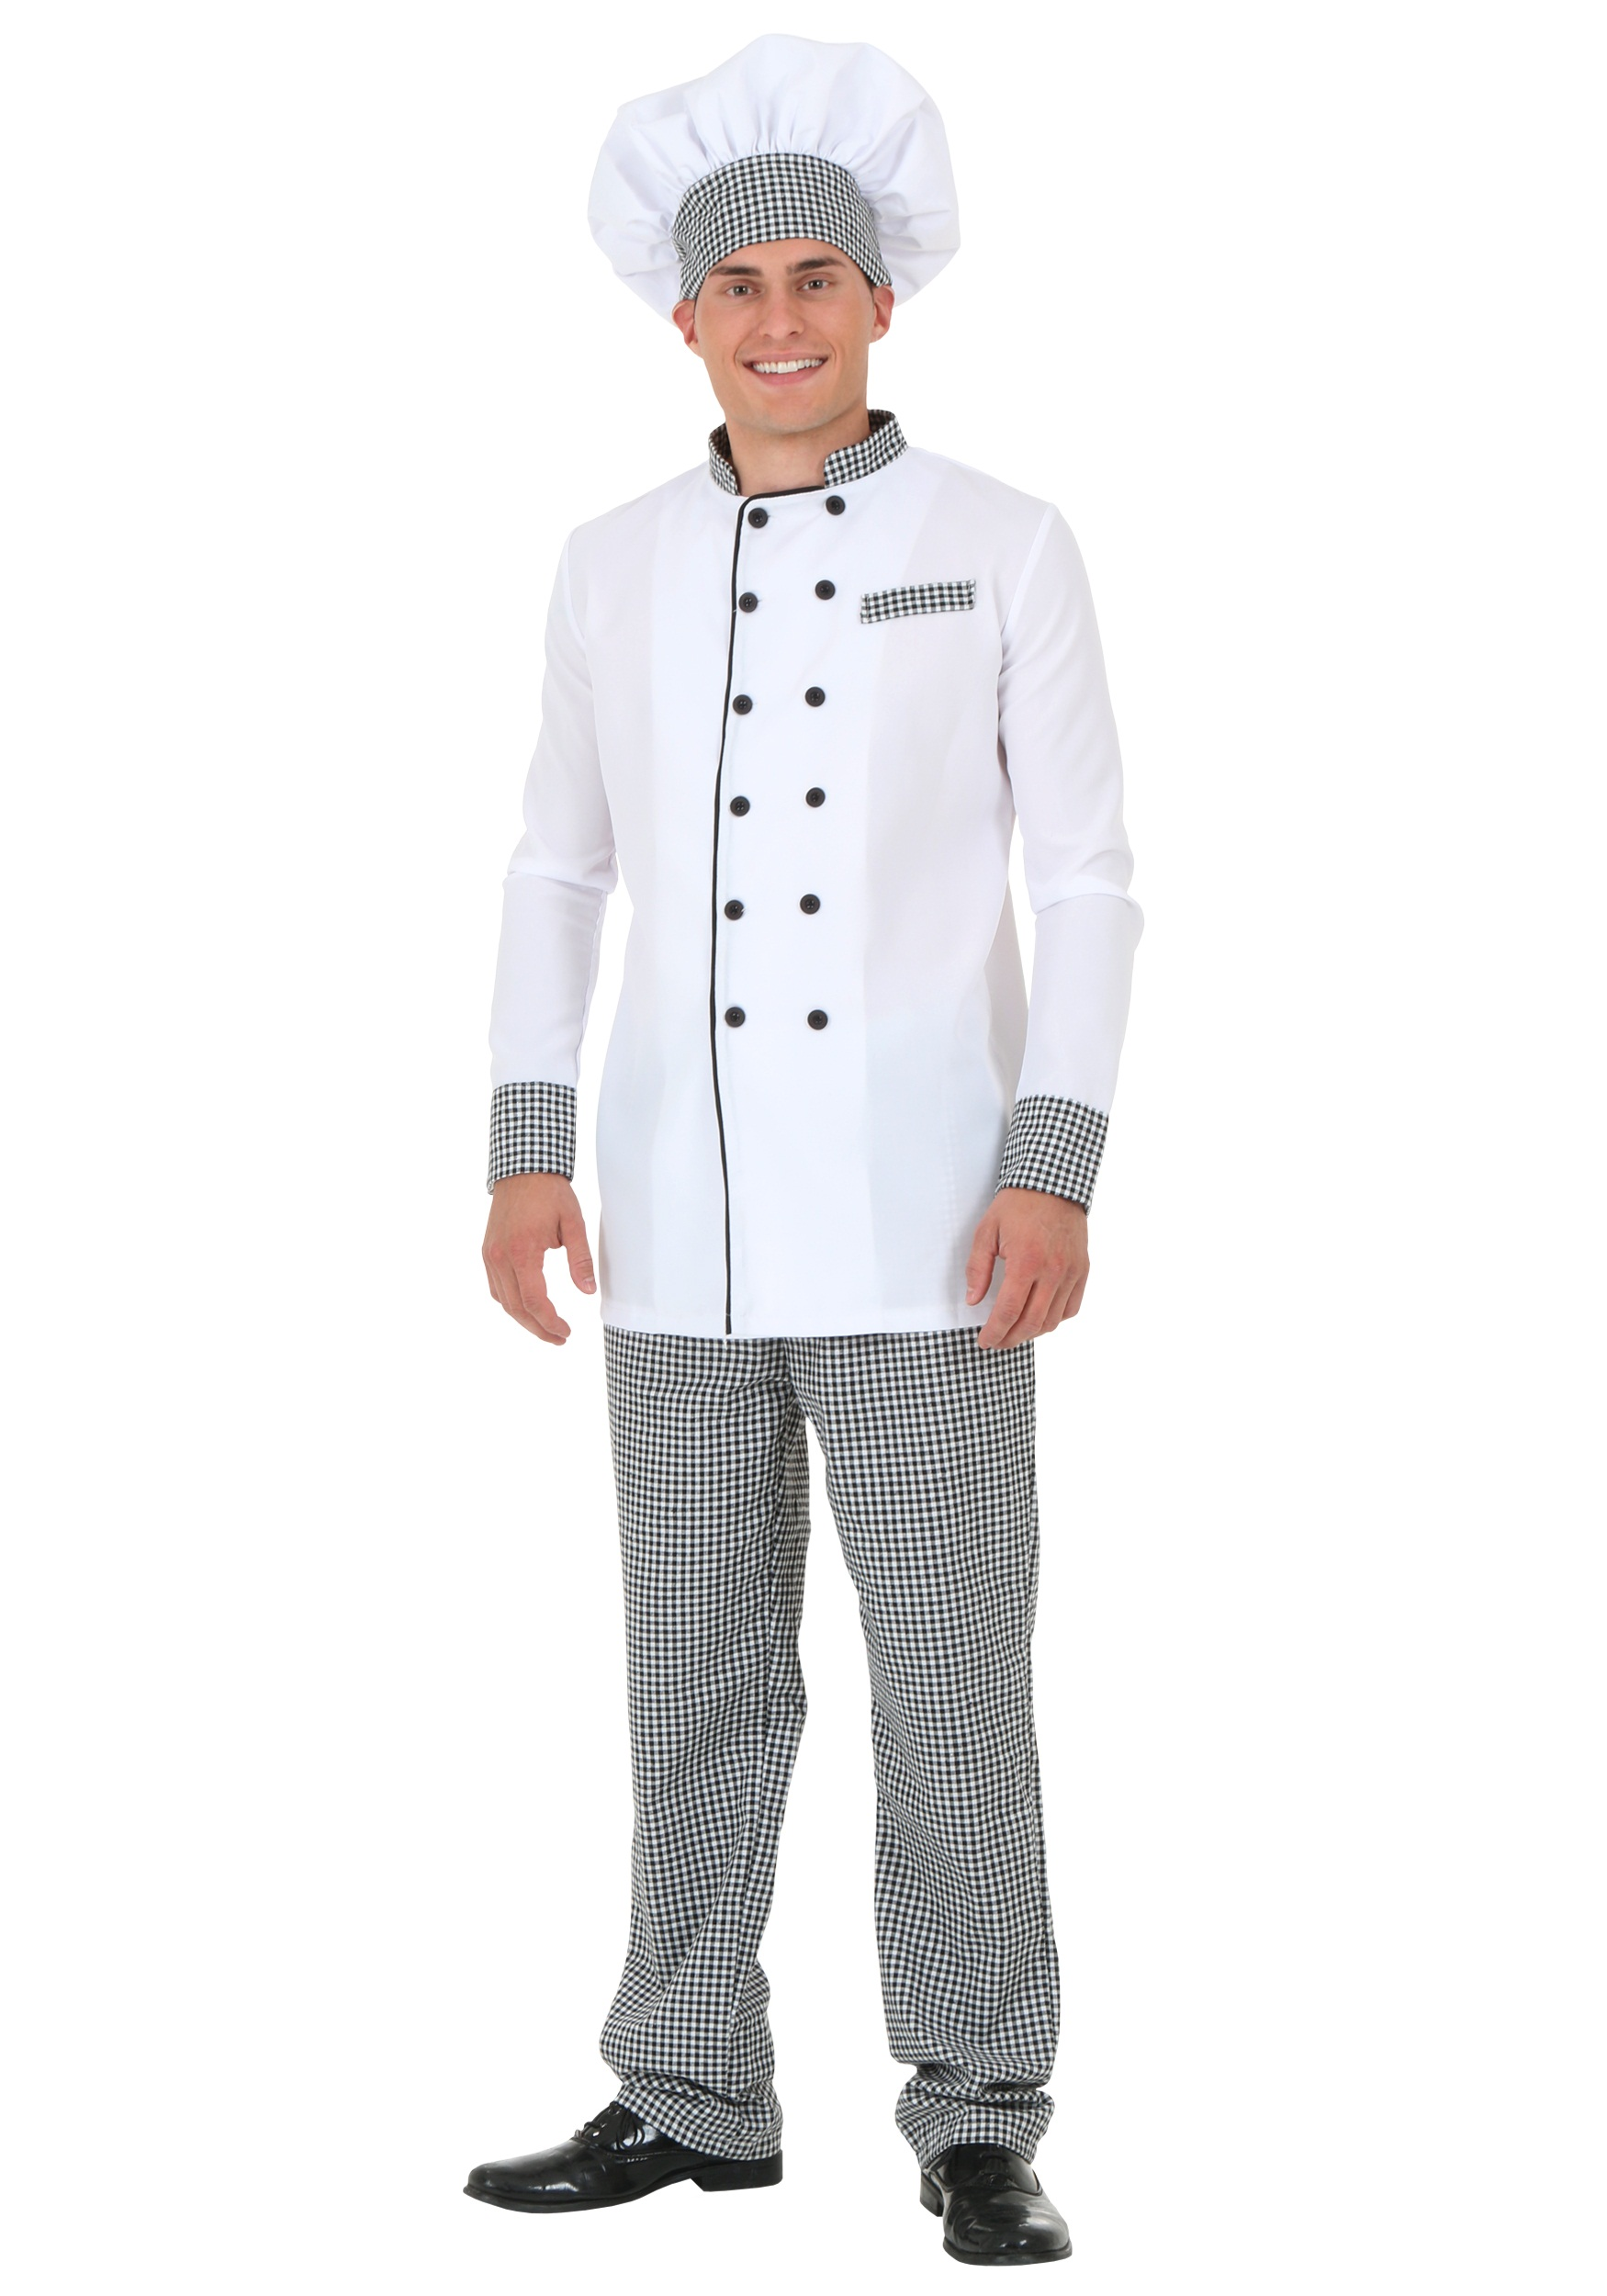 White Chef Jacket Costume for Men